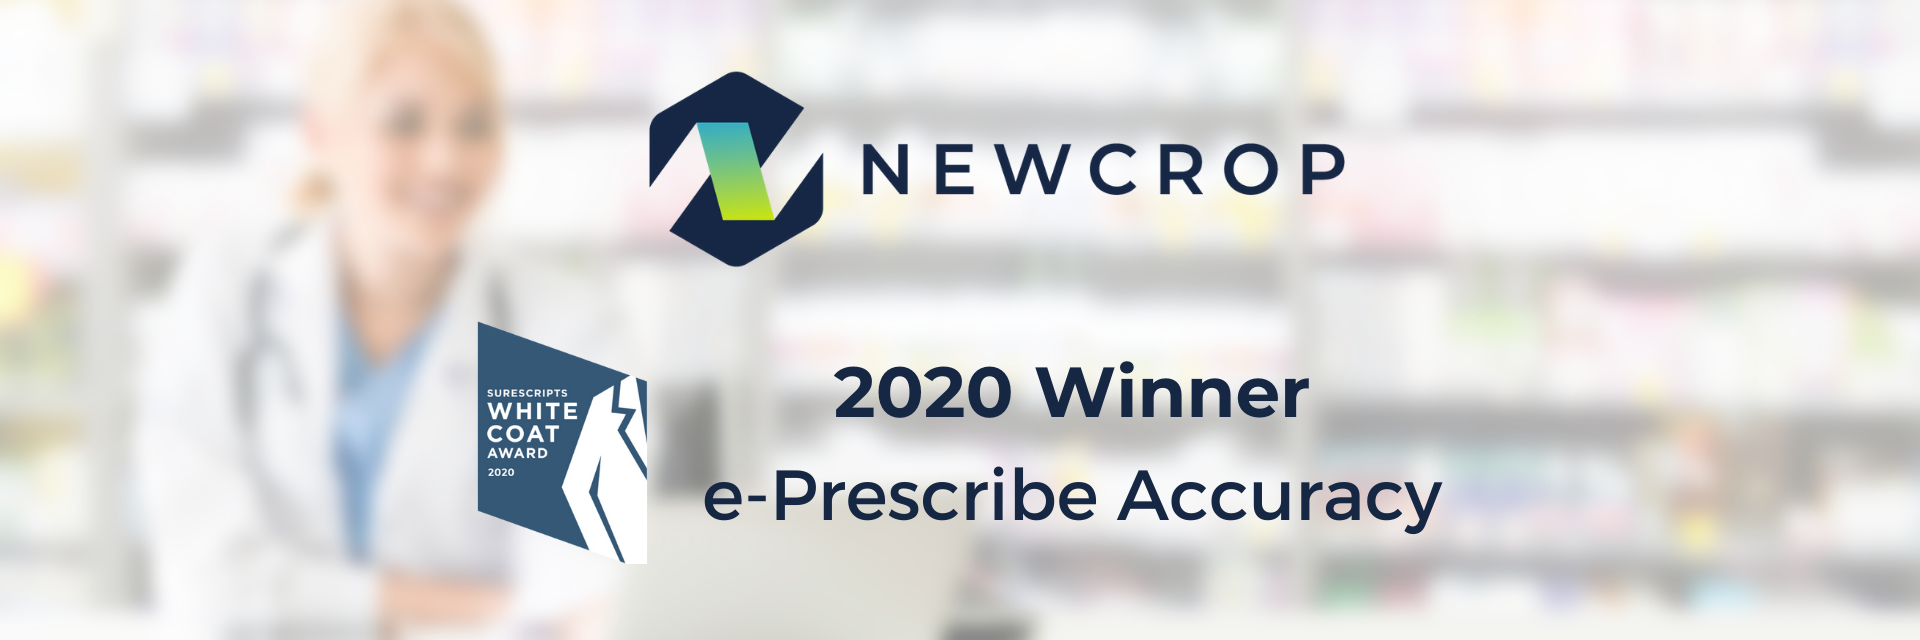 NC  2020 Winner e-Prescribe Accuracy (1920 x 640 px)